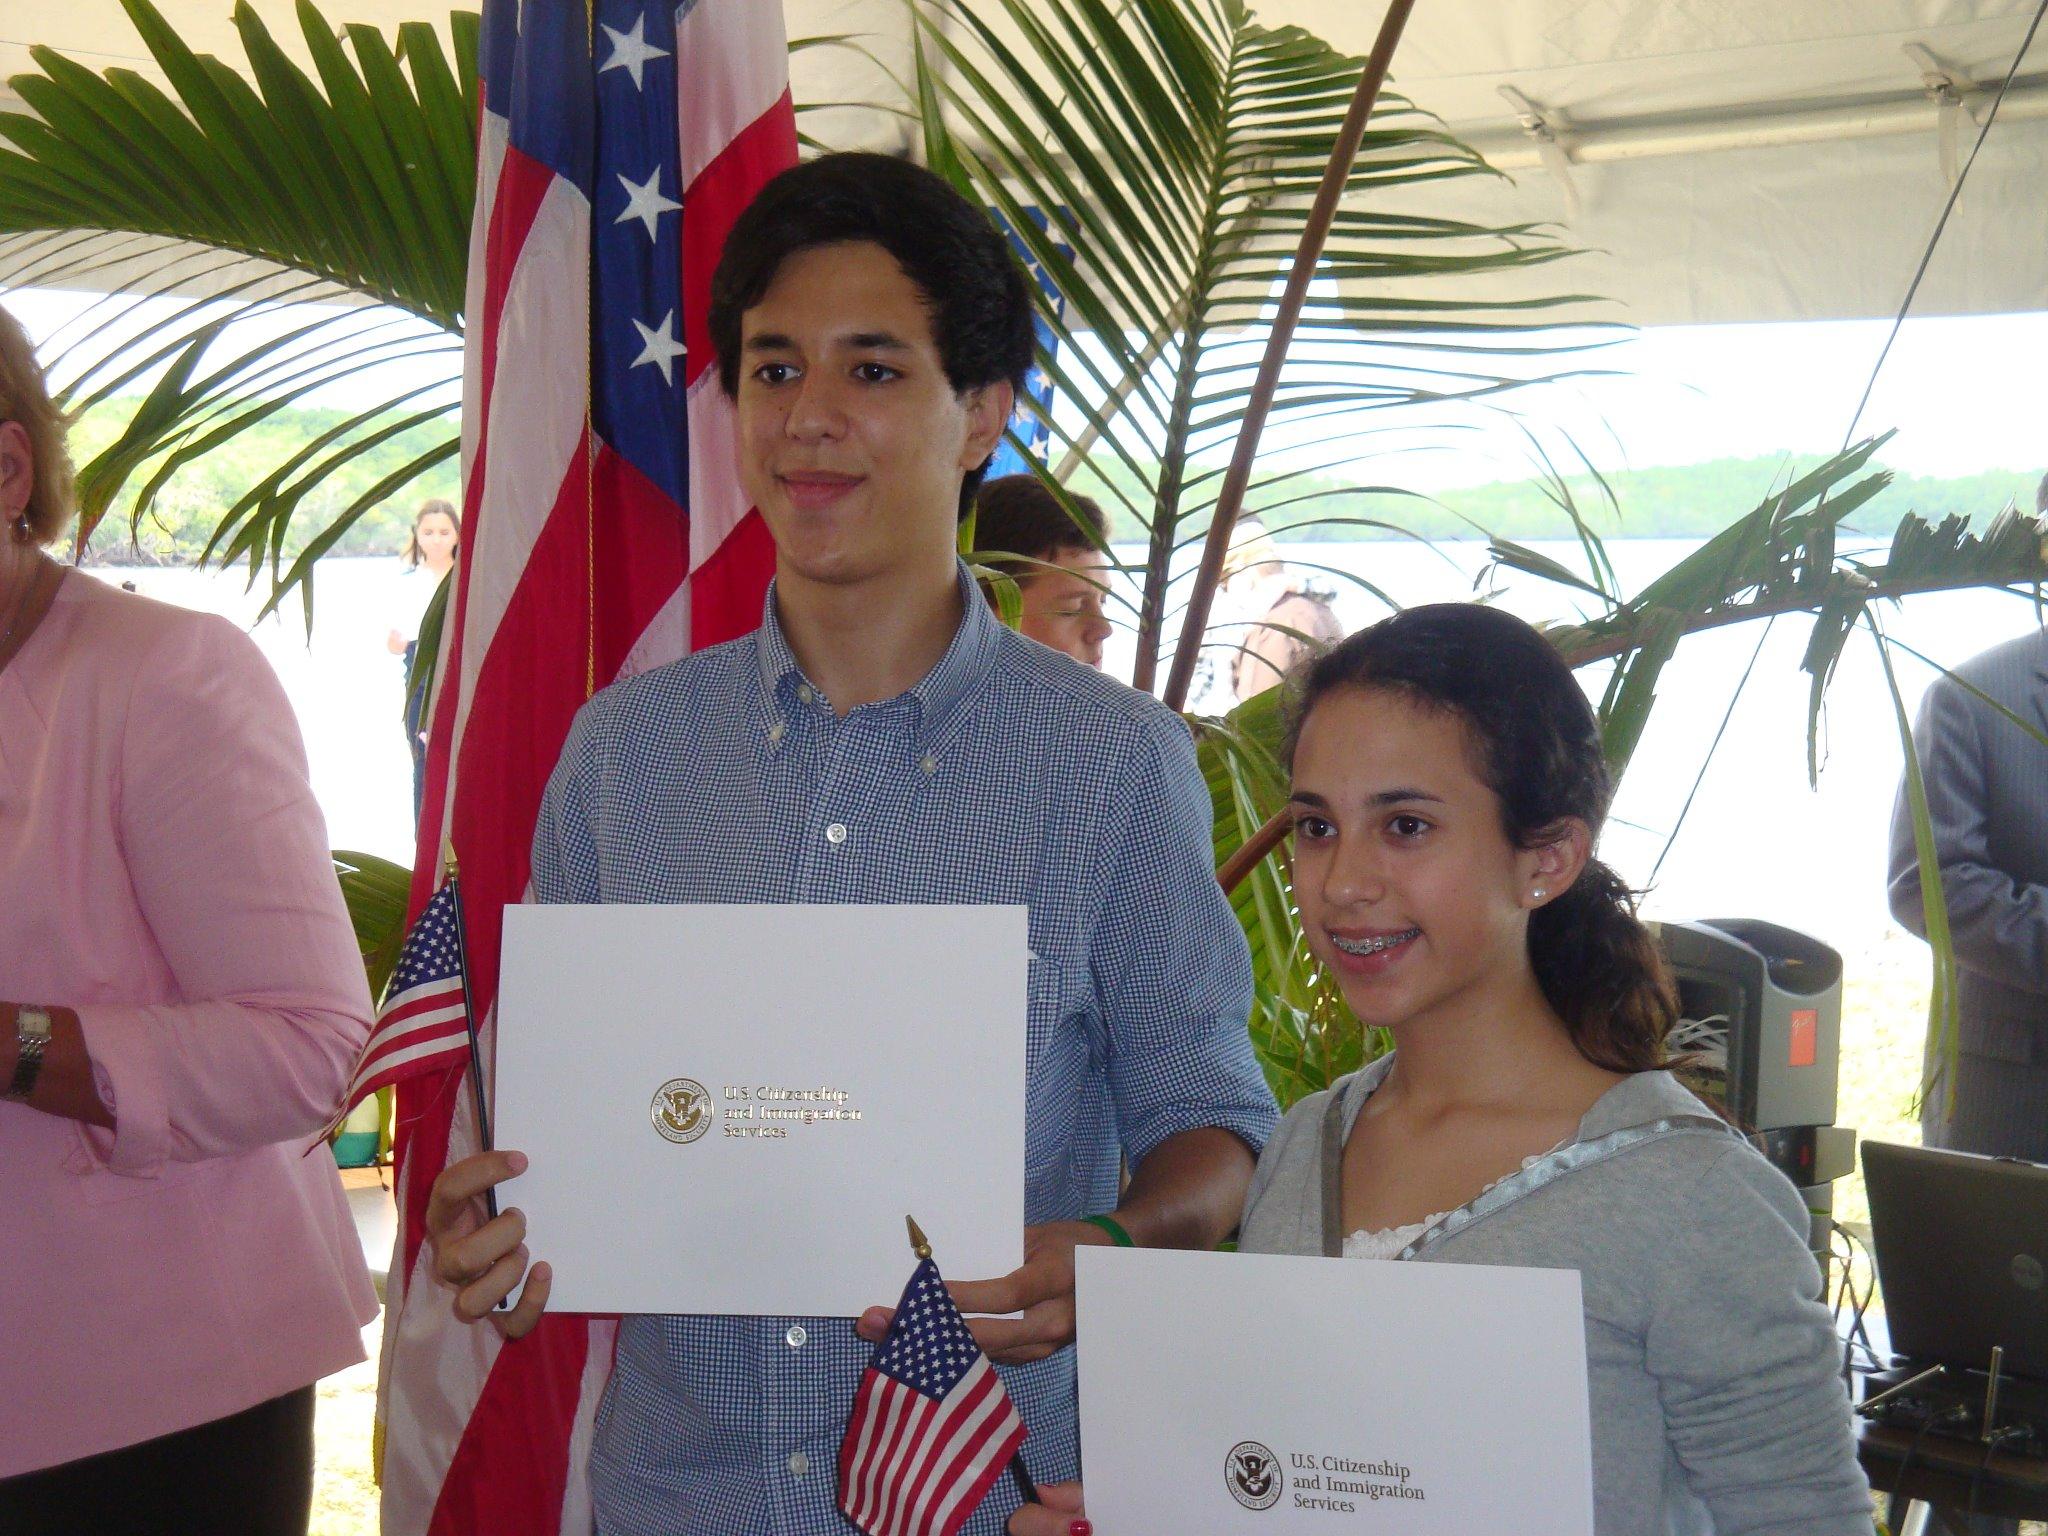 BISC Citizenship Ceremony 2012